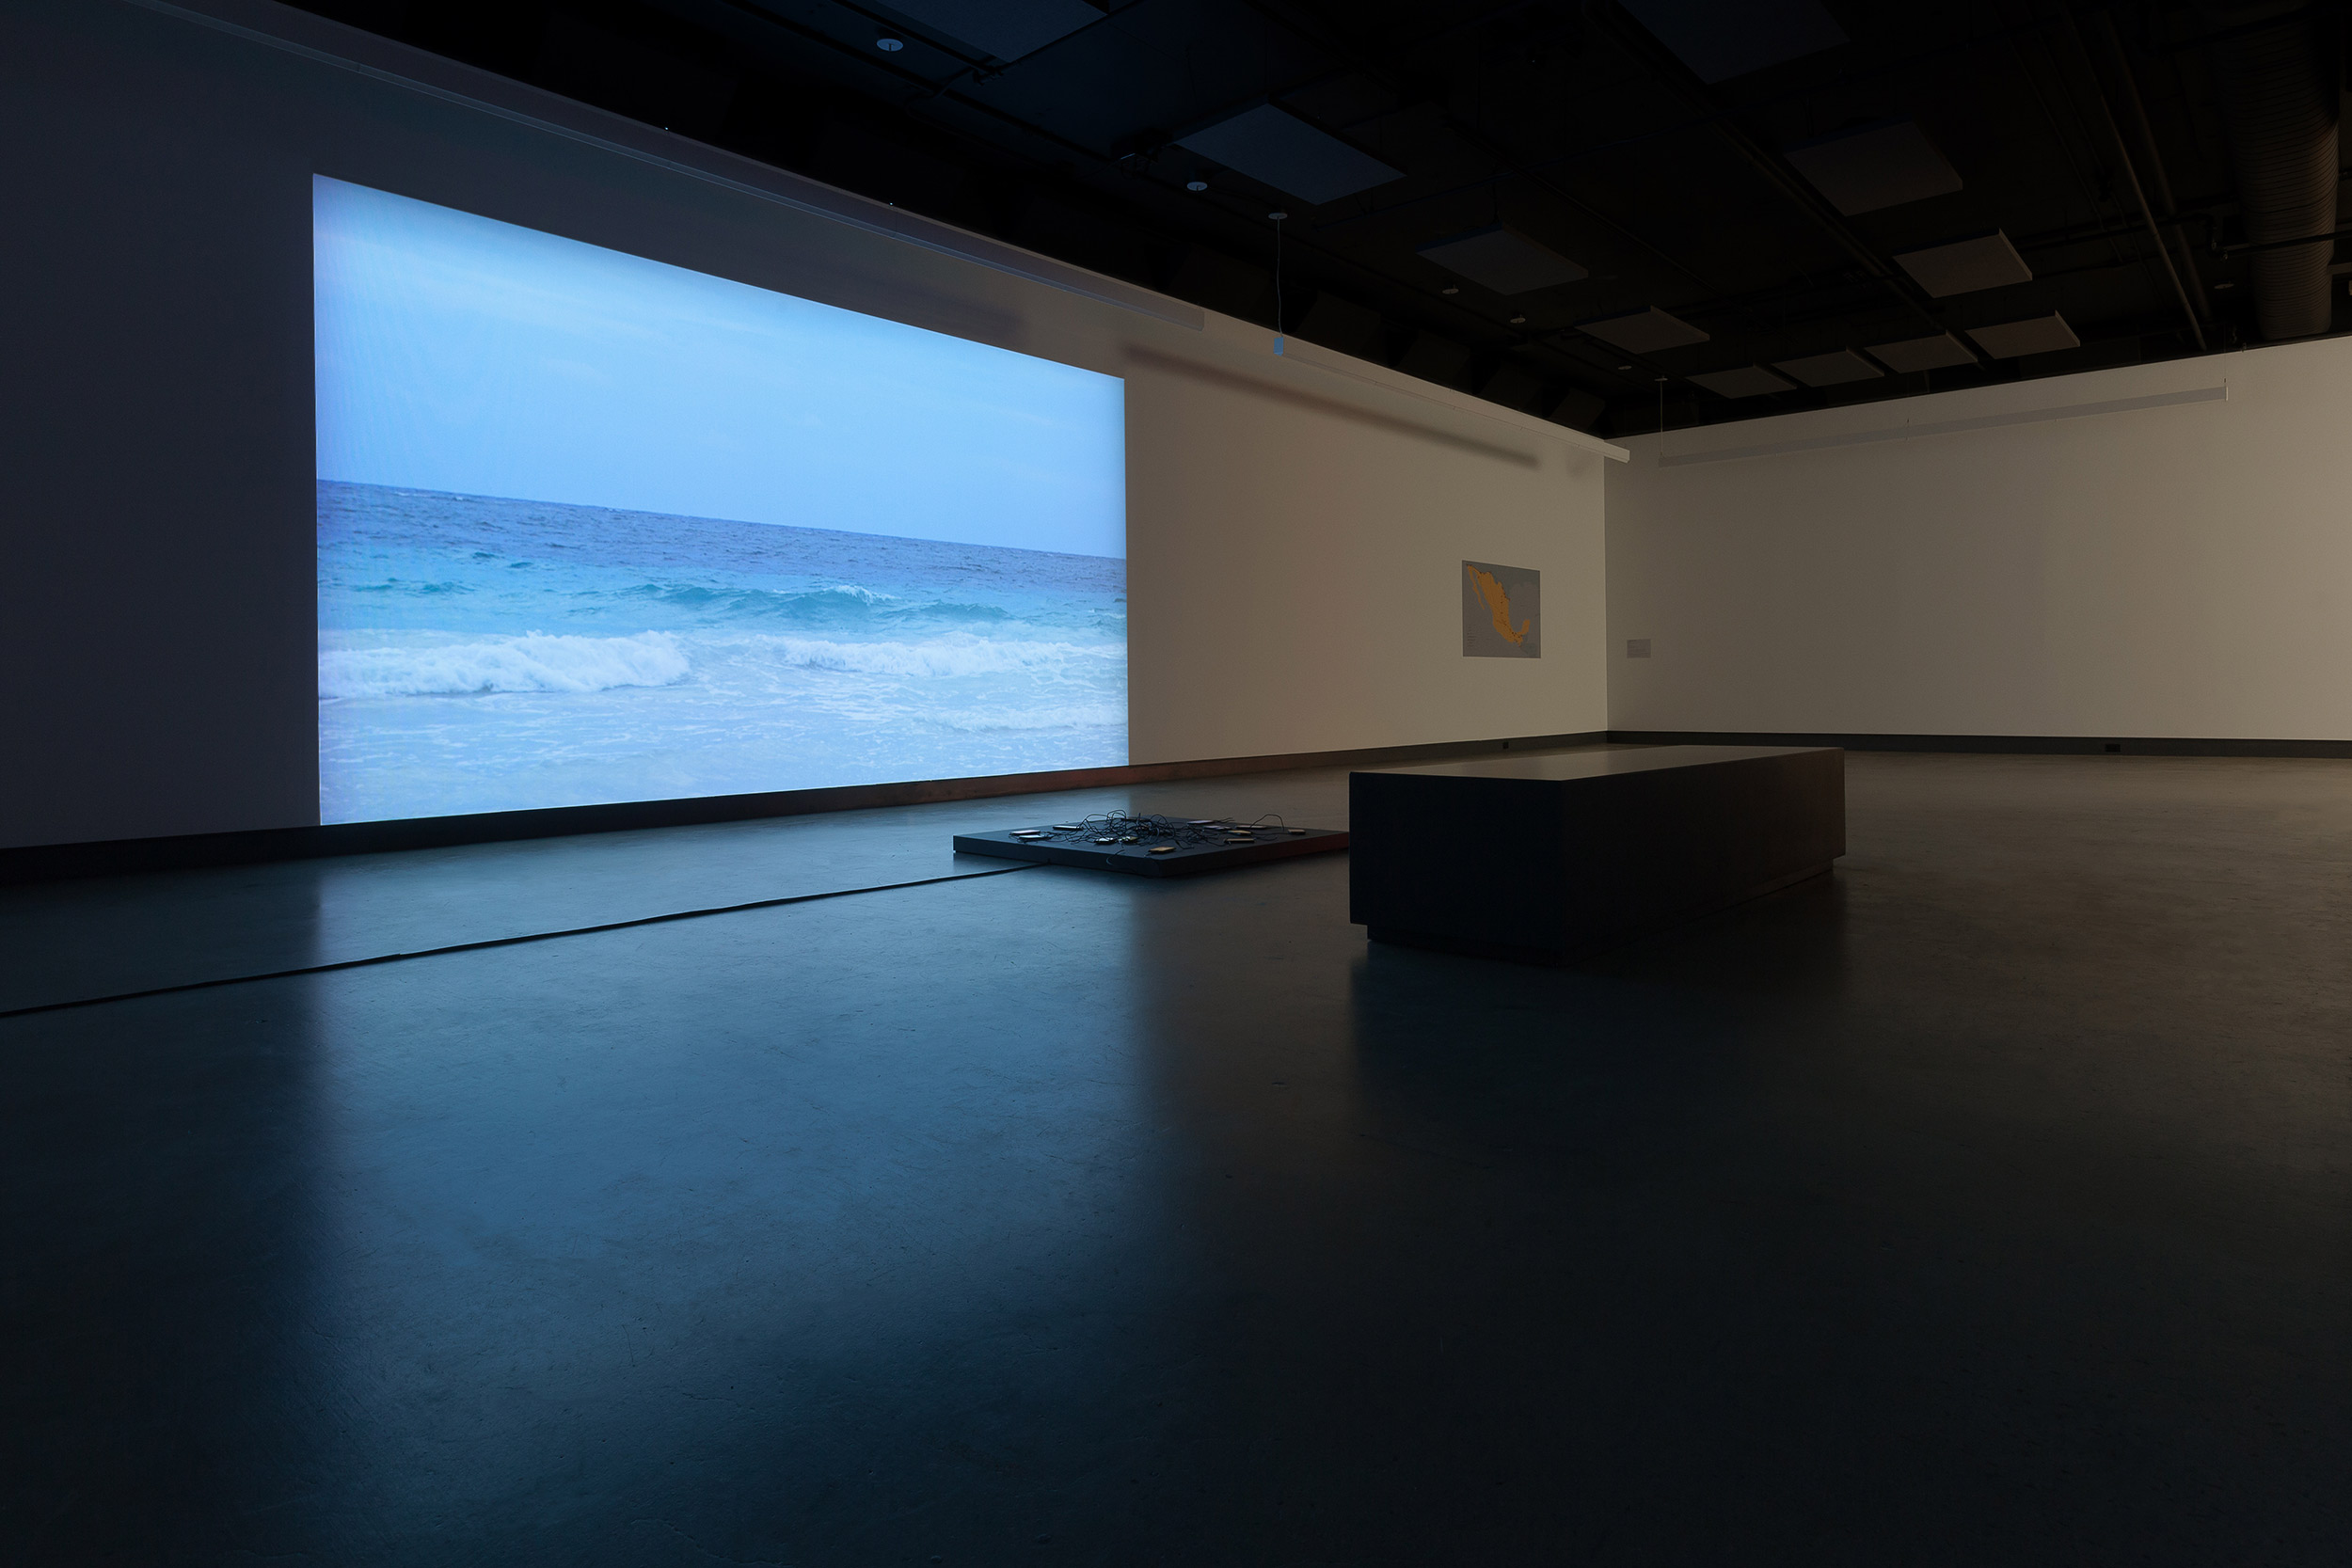 © Hubert Caron-Guay, vue de l'installation  Arroyos (2017). Photo : Marilou Crispin.